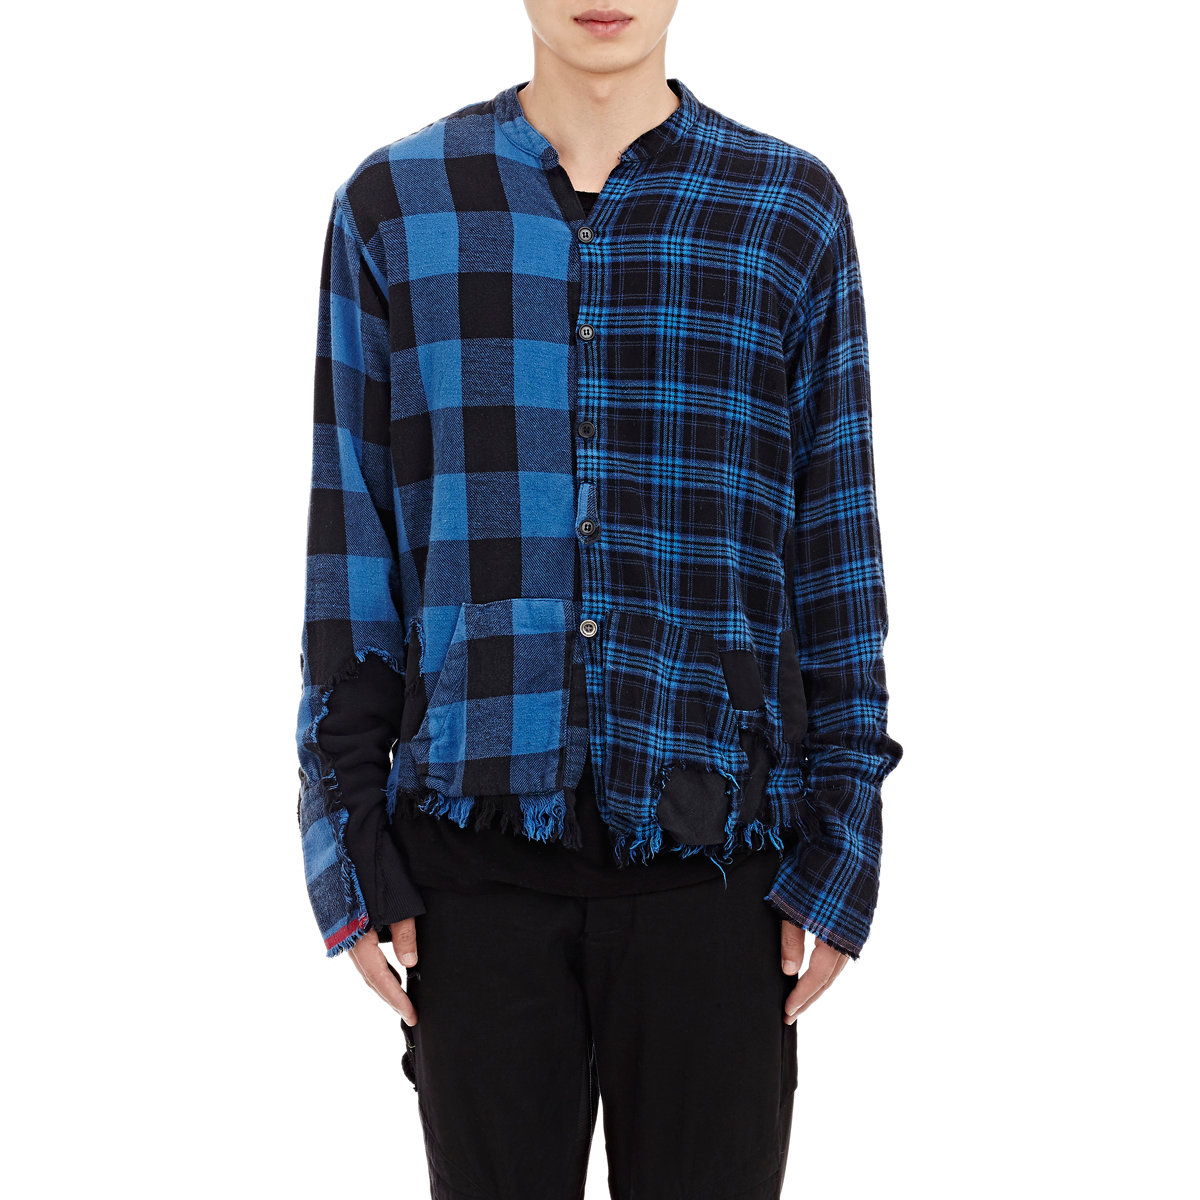 miguel blue greg lauren plaid flannel distressed shirt